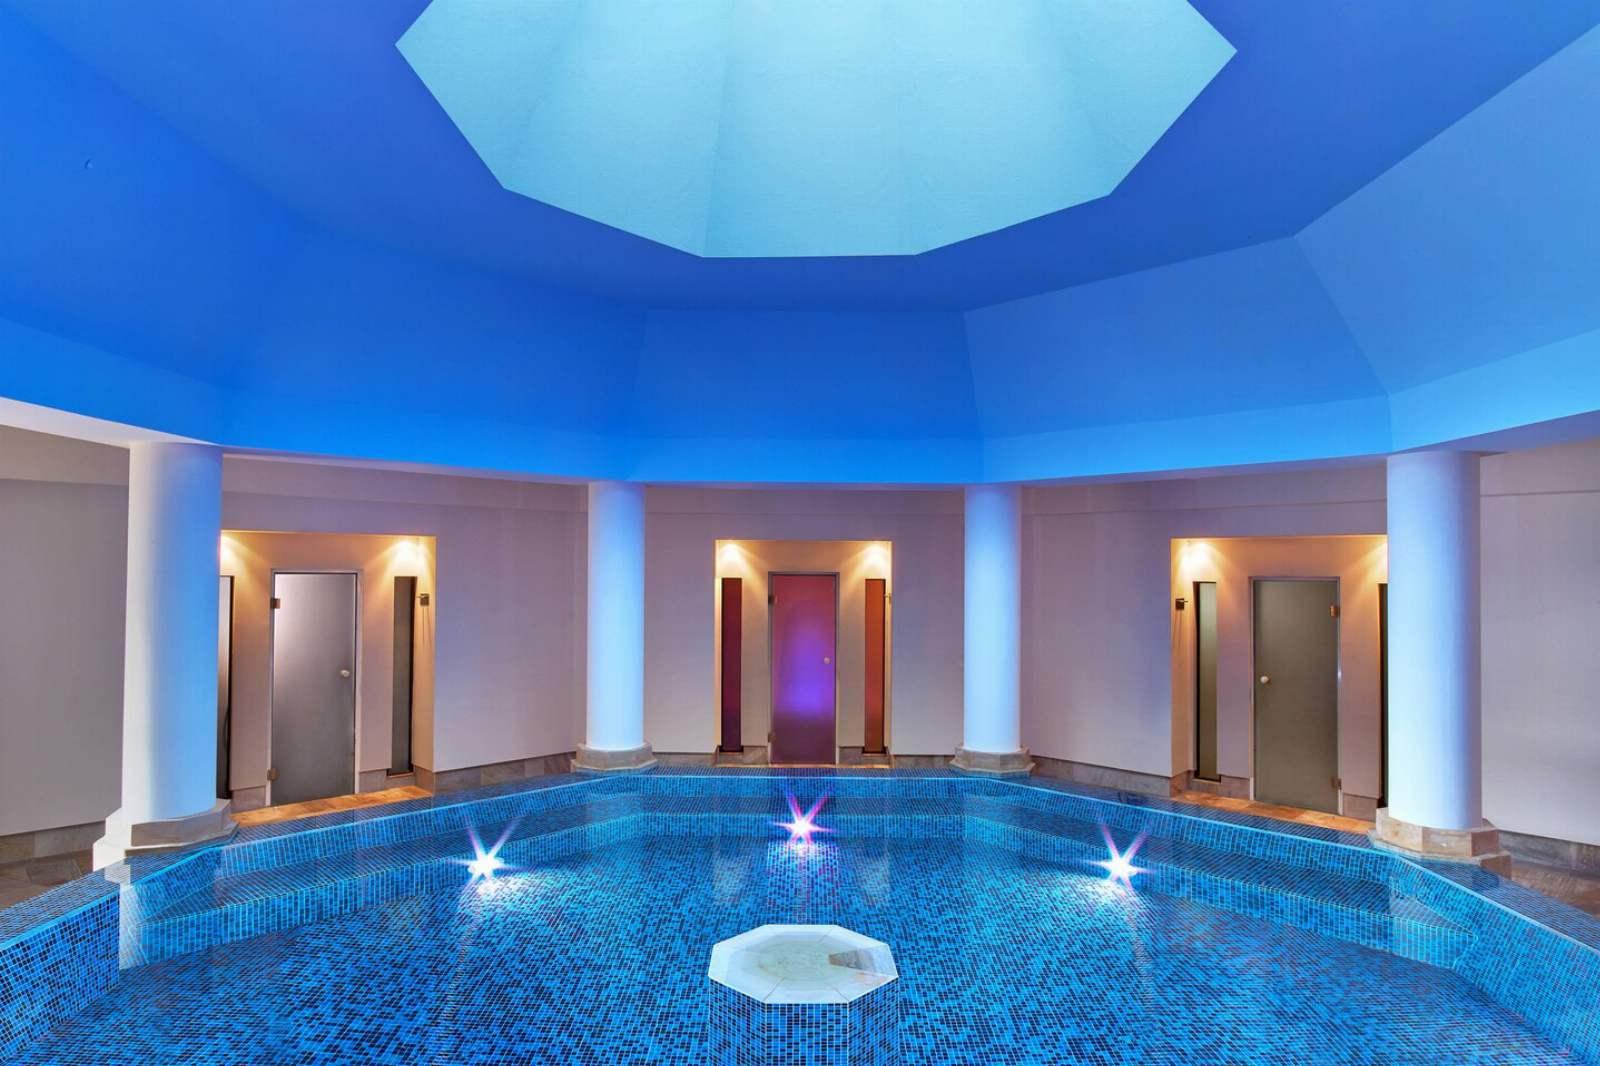 St. Regis Mardavall Resort - Arabella Spa Indoor Pool